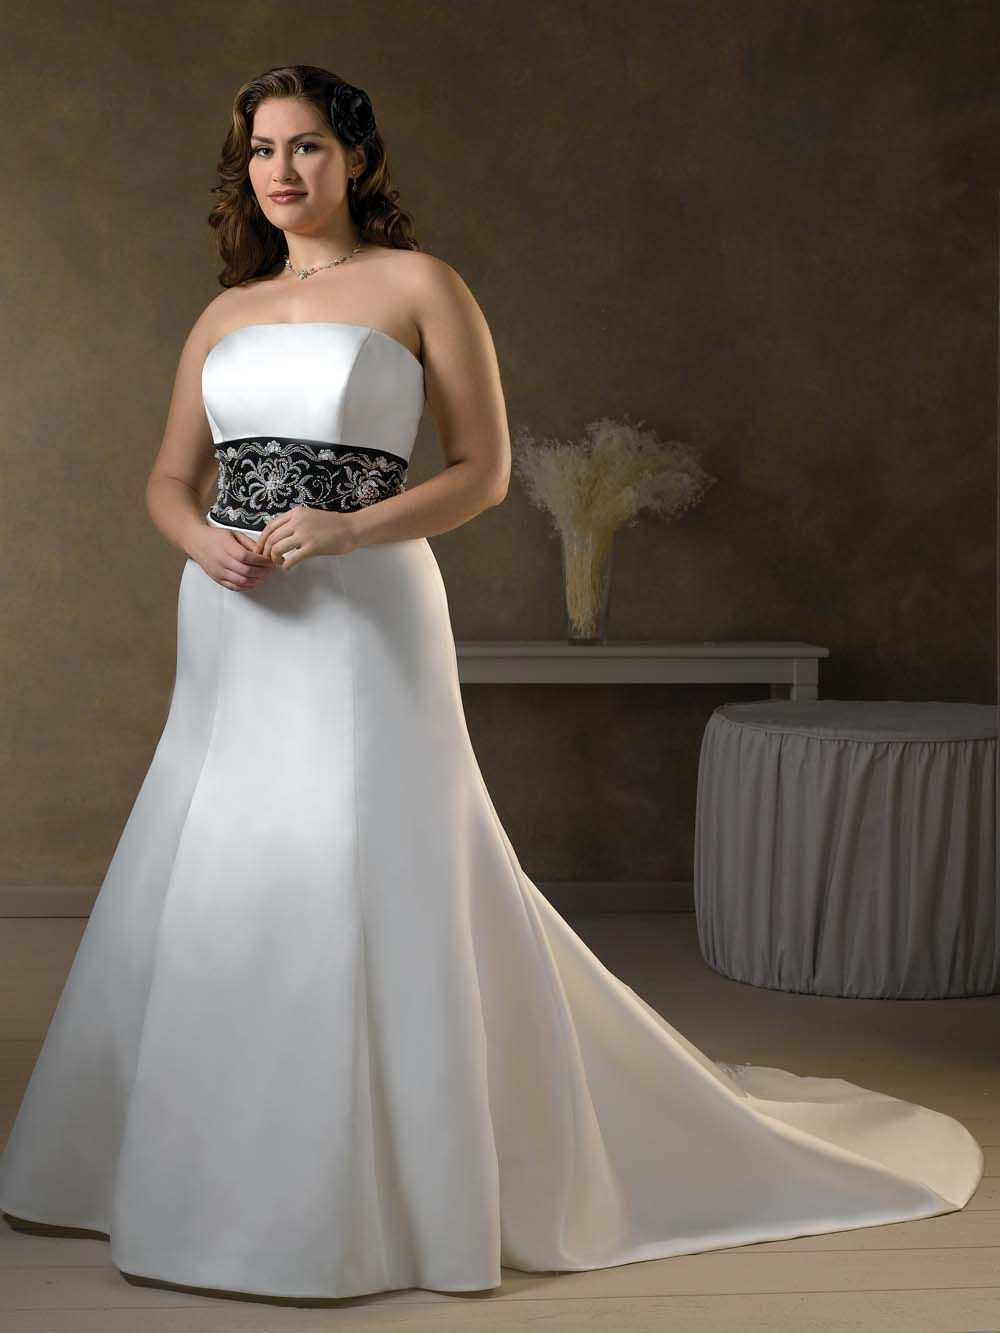 forever 21 plus size dress wedding dresses for cheap Plus size bridesmaid dresses cheap Wedding Dresses For Second Time Brides Plus Size Best Plus